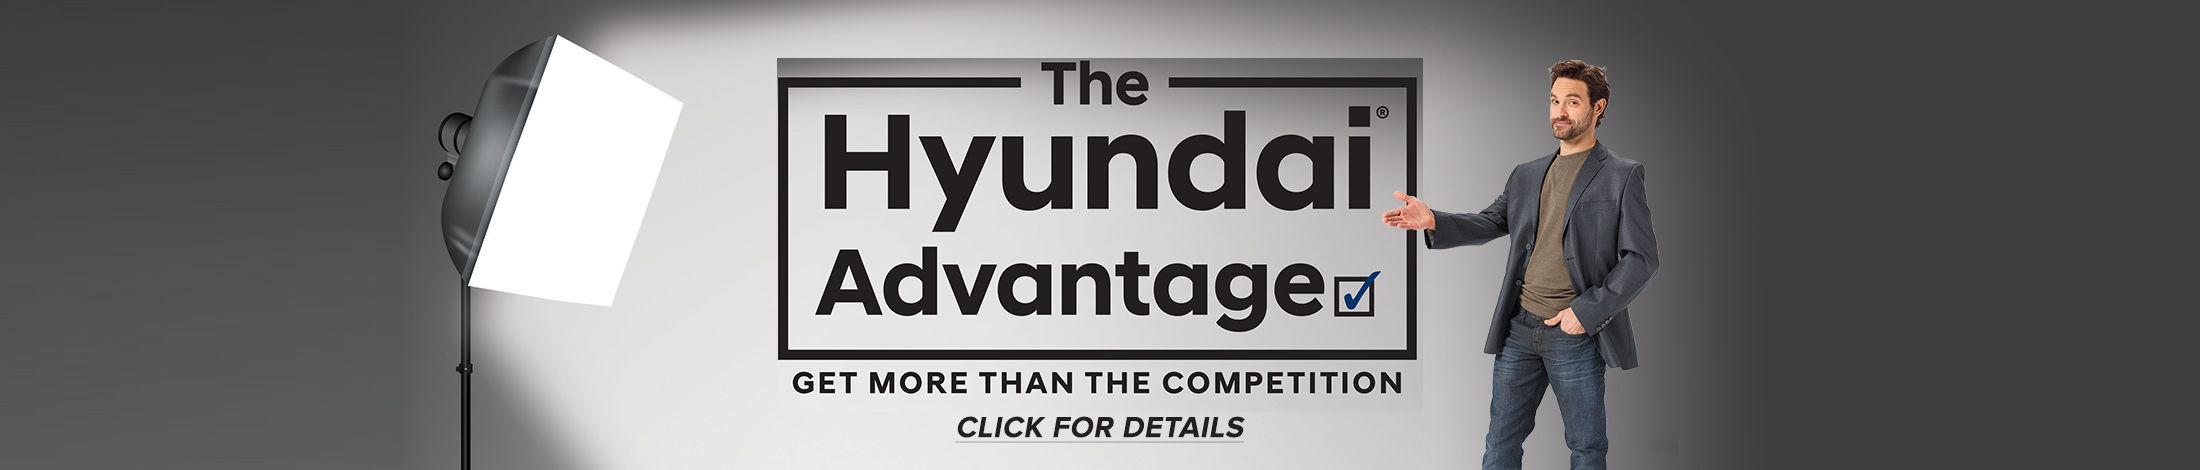 Header betty du mois Hyundai